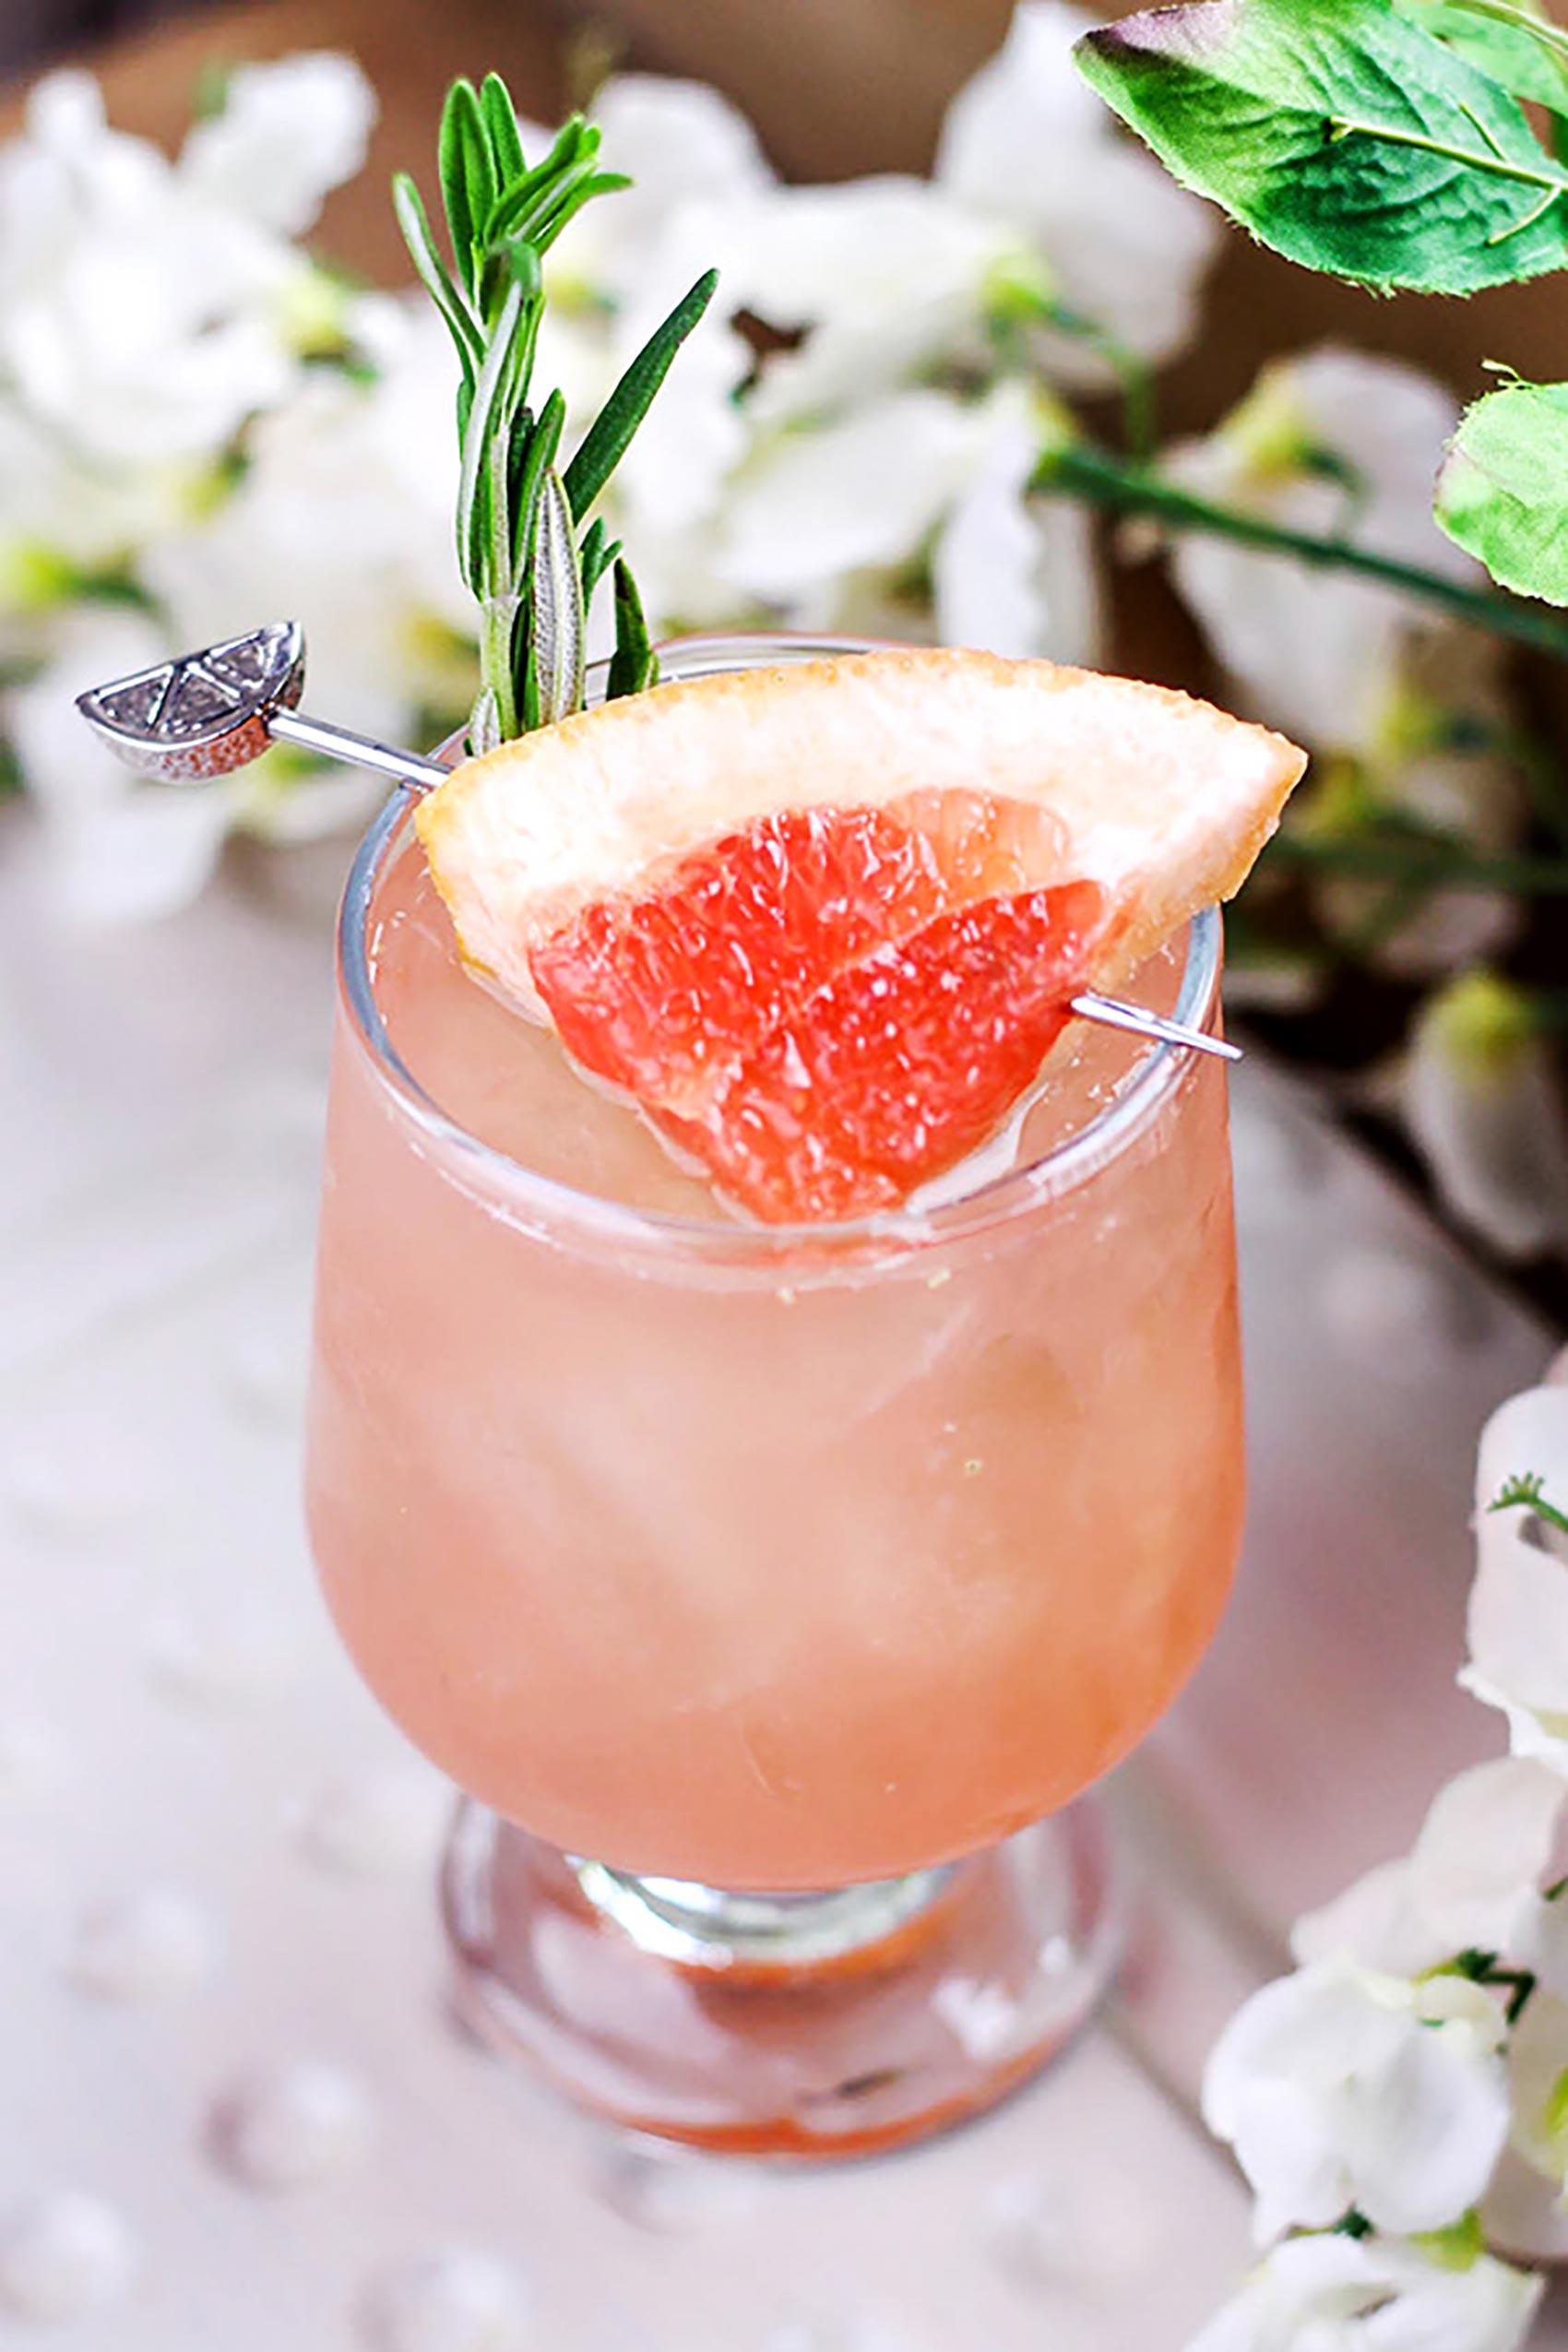 Ruby Red Grapefruit & Jalapeno Cocktail Recipe